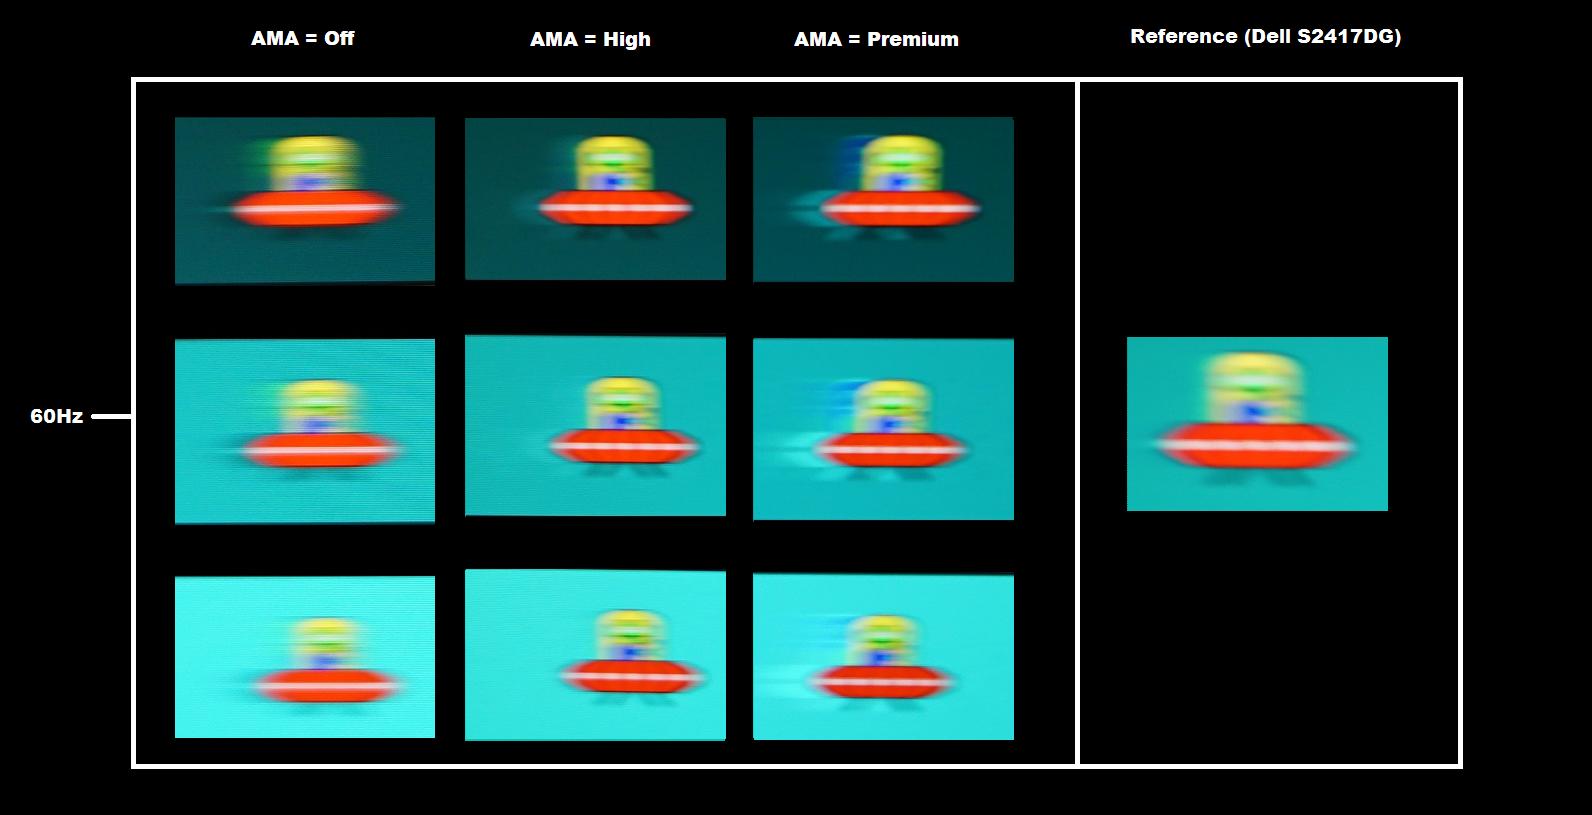 Perceived blur, various settings